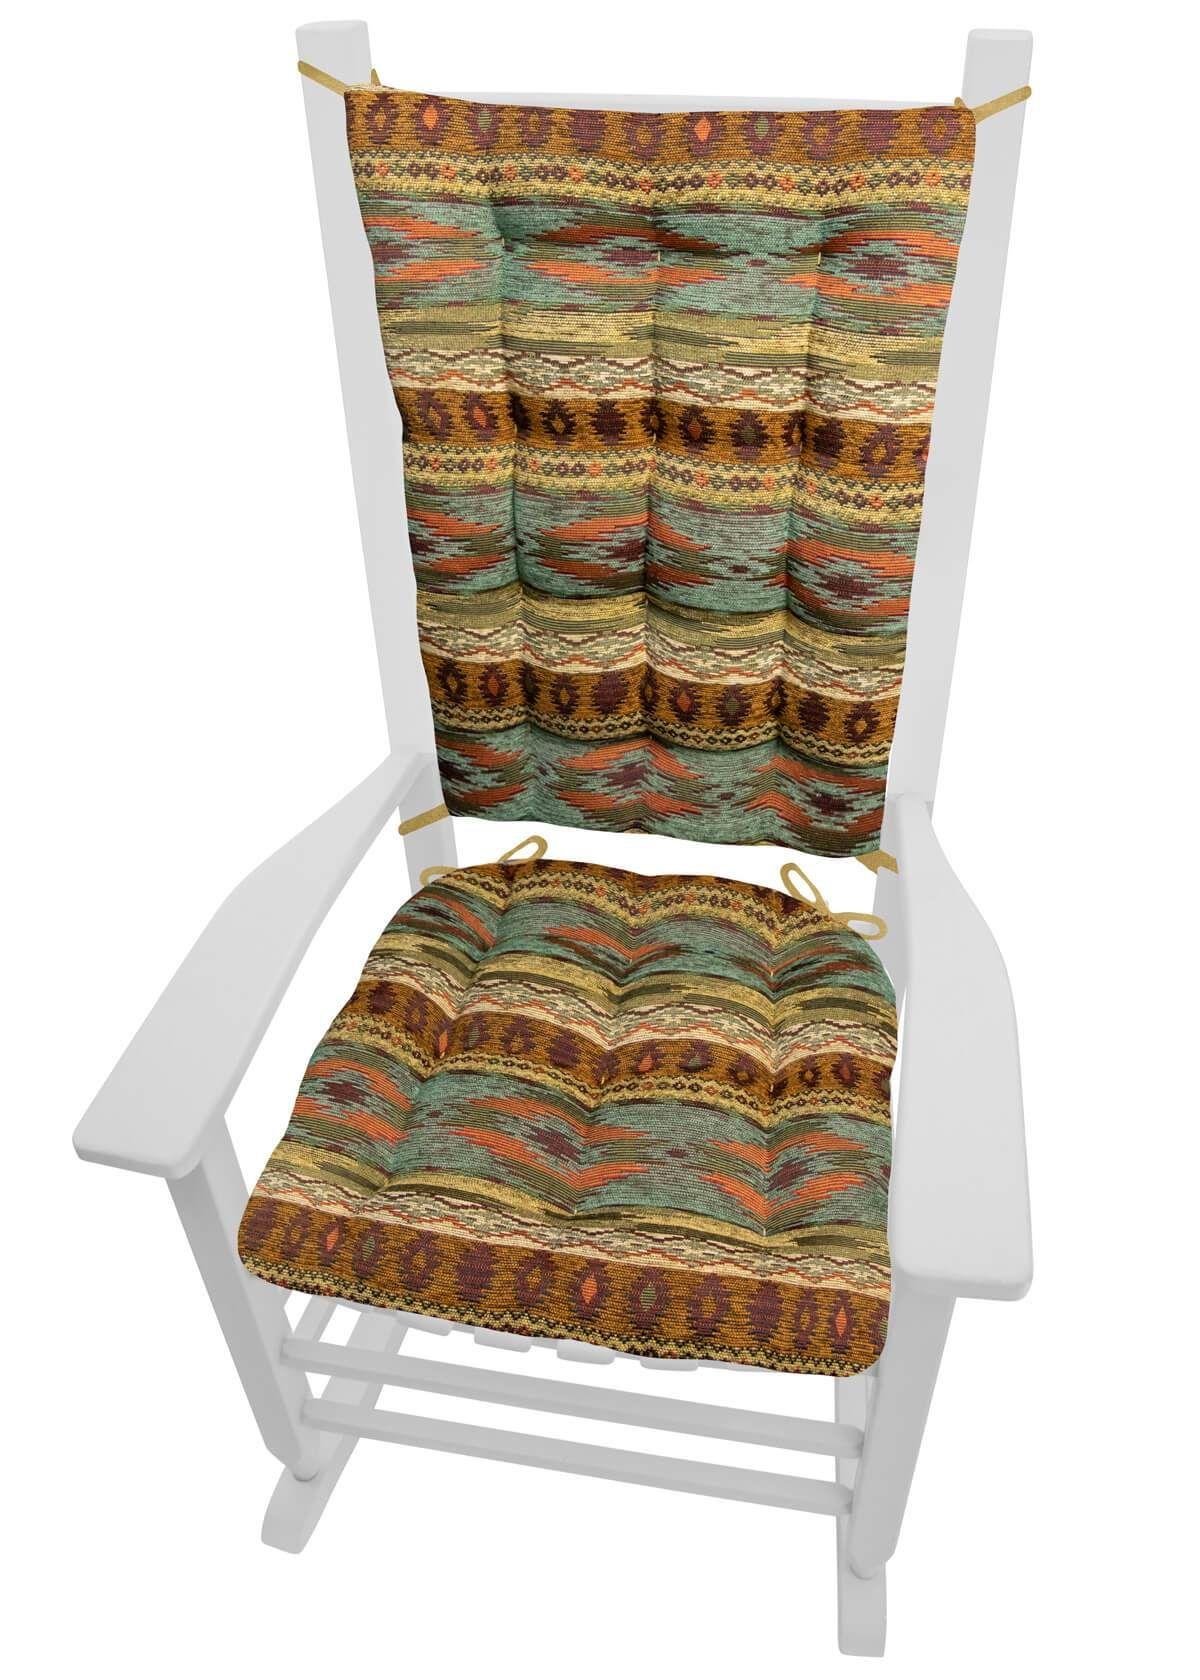 Southwest tucson desert rocking chair cushions latex foam fill